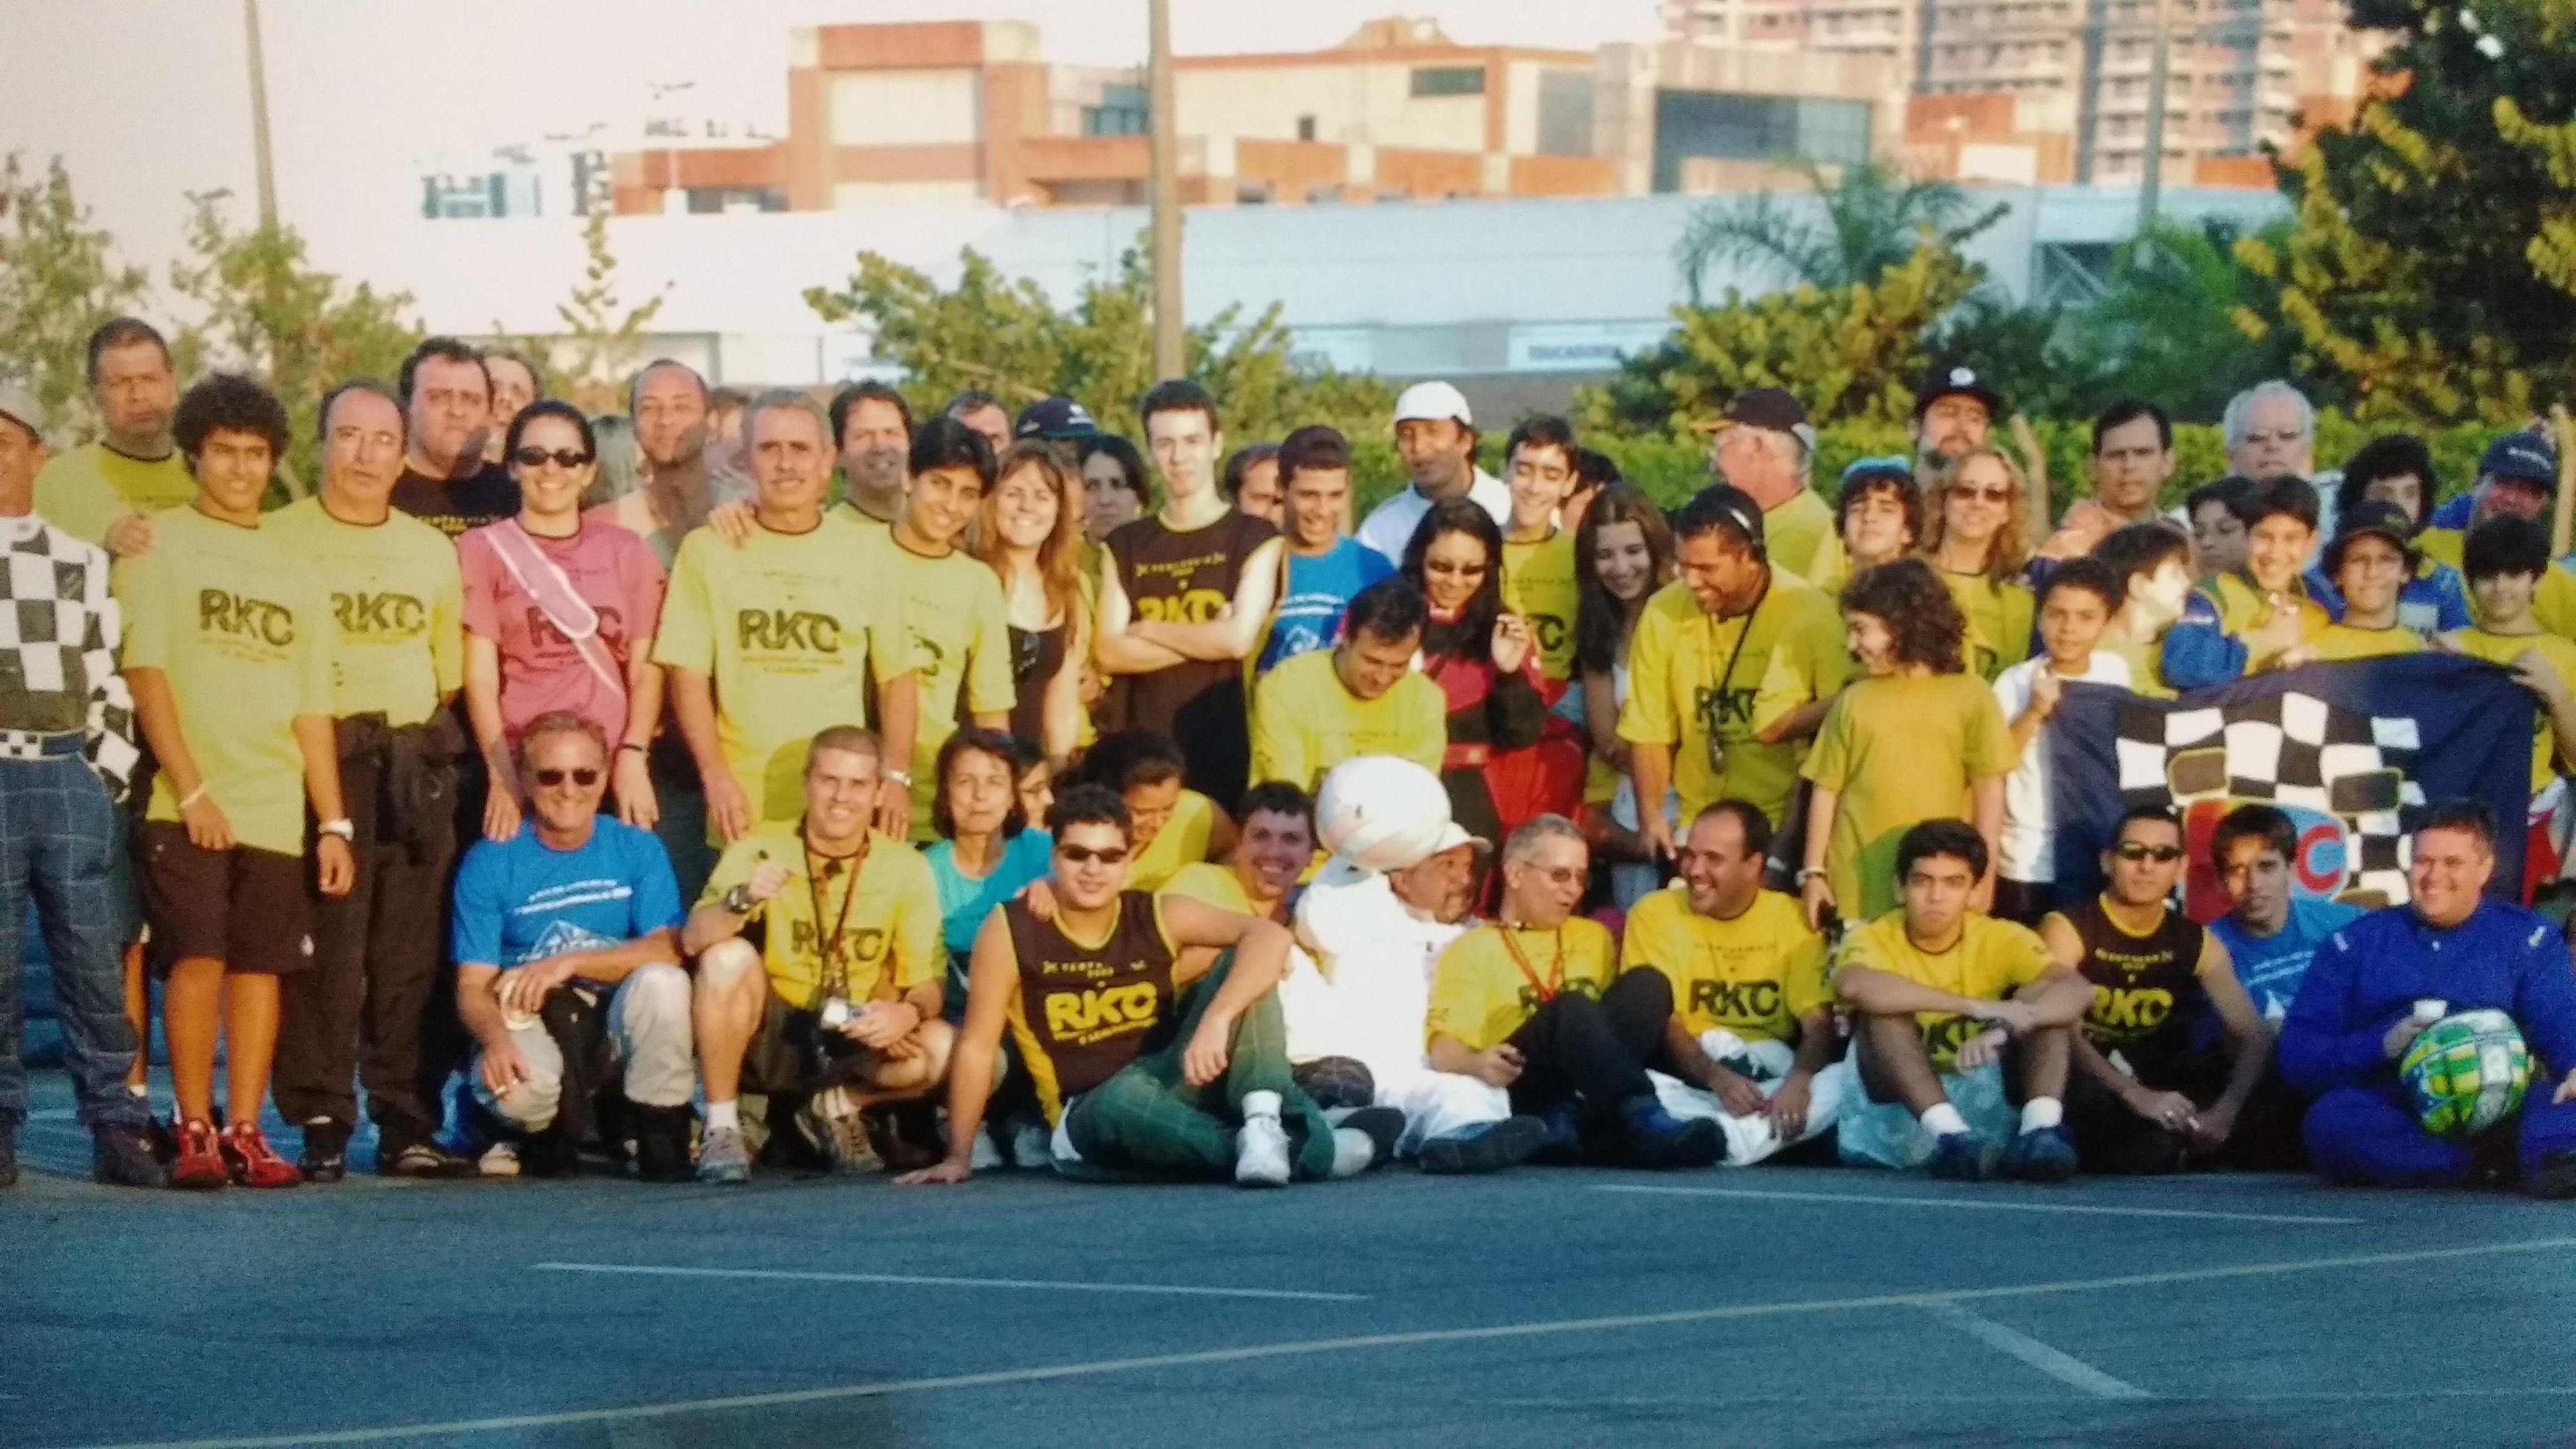 Foto Oficial RKC 2005